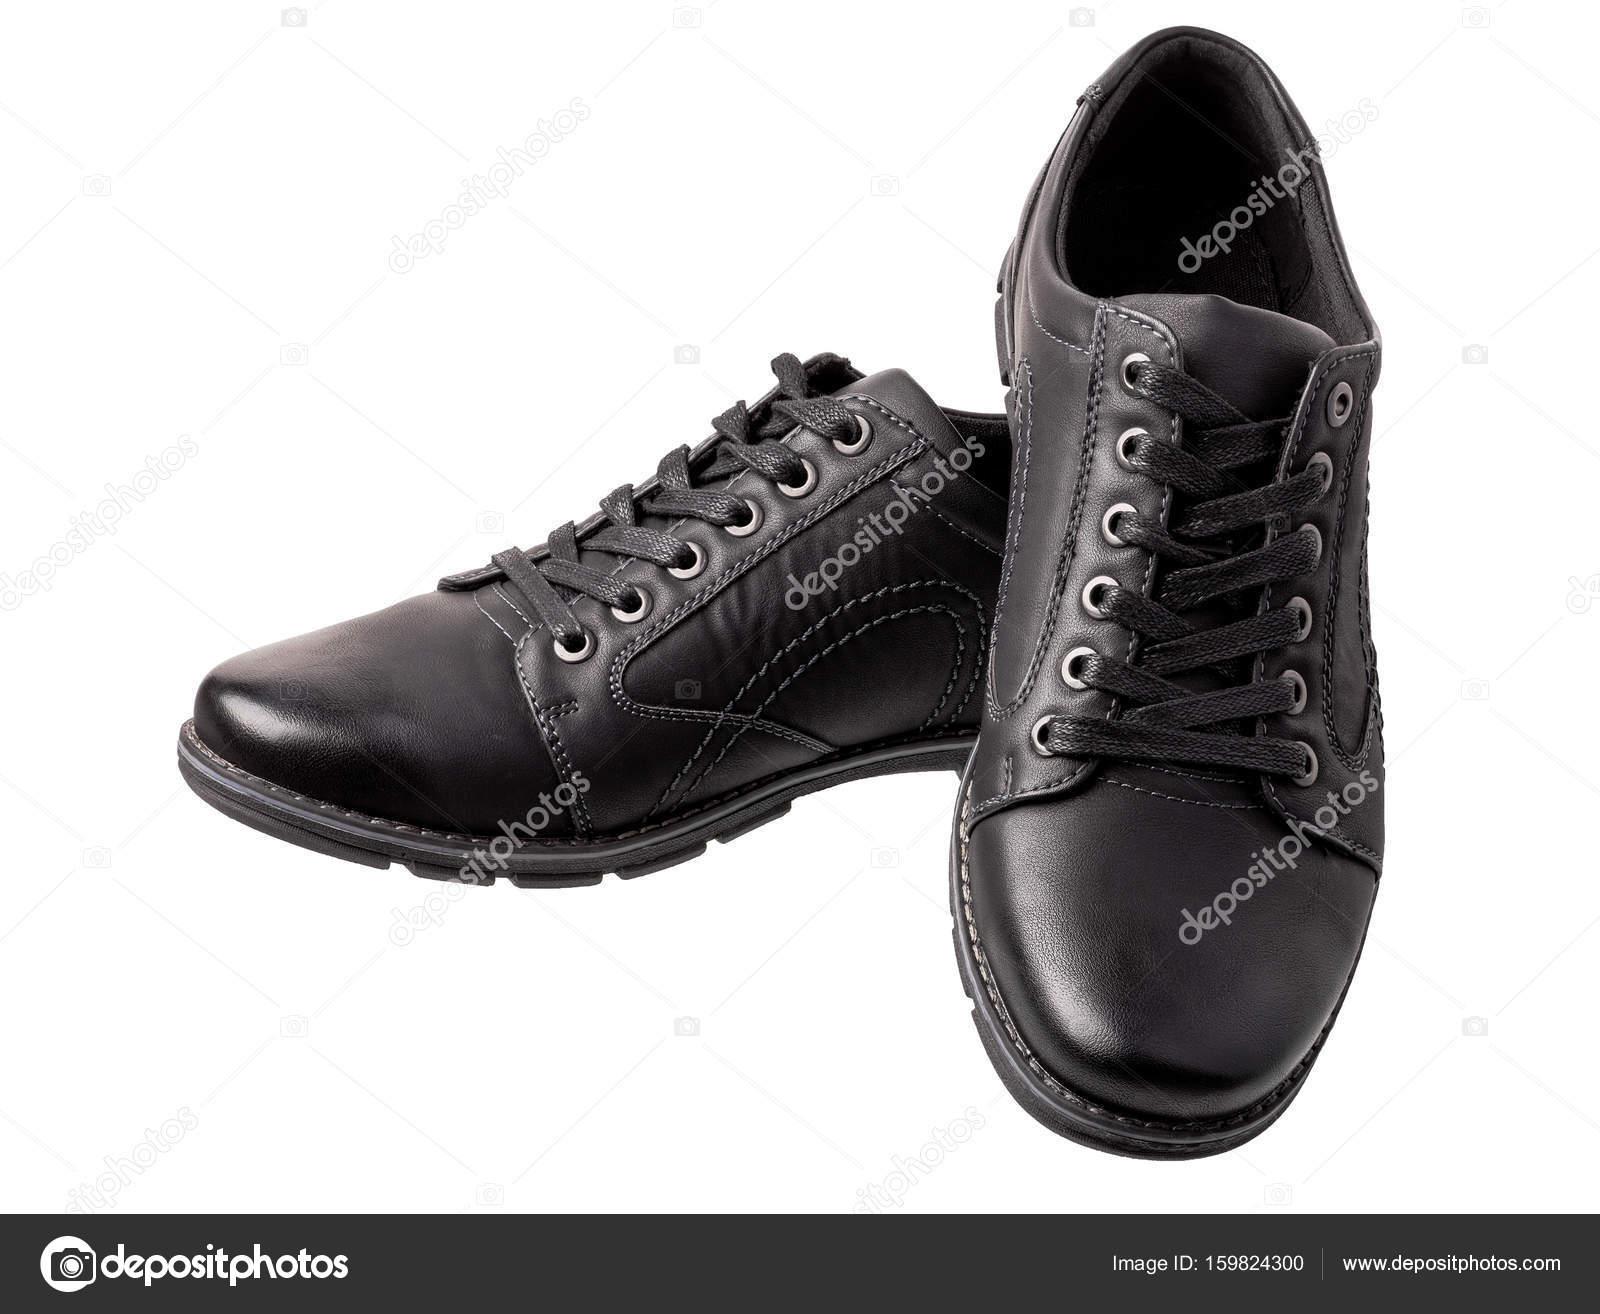 d74d8d14c1a Ζευγάρι παπούτσια μαύρο άνδρες που απομονώνονται σε λευκό φόντο. Υποδήματα  βρίσκεται σε γωνία με την camer — Εικόνα από ...